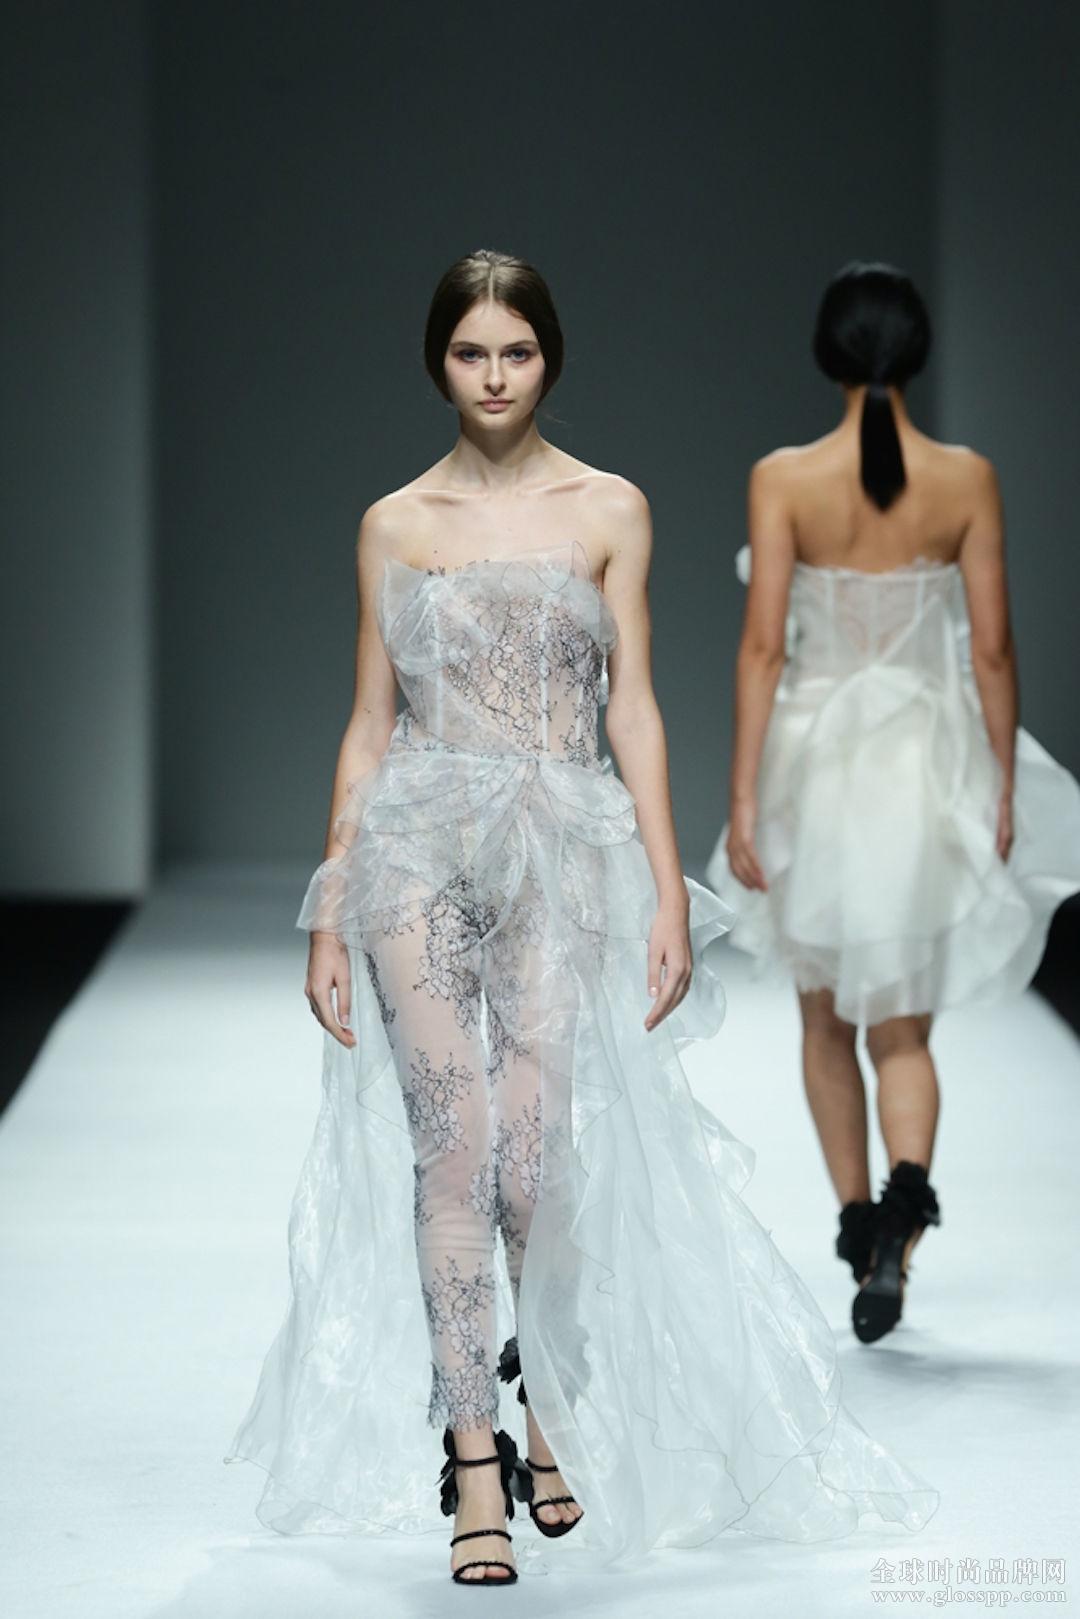 we couture 的礼服和婚纱 more is more 上海时装周